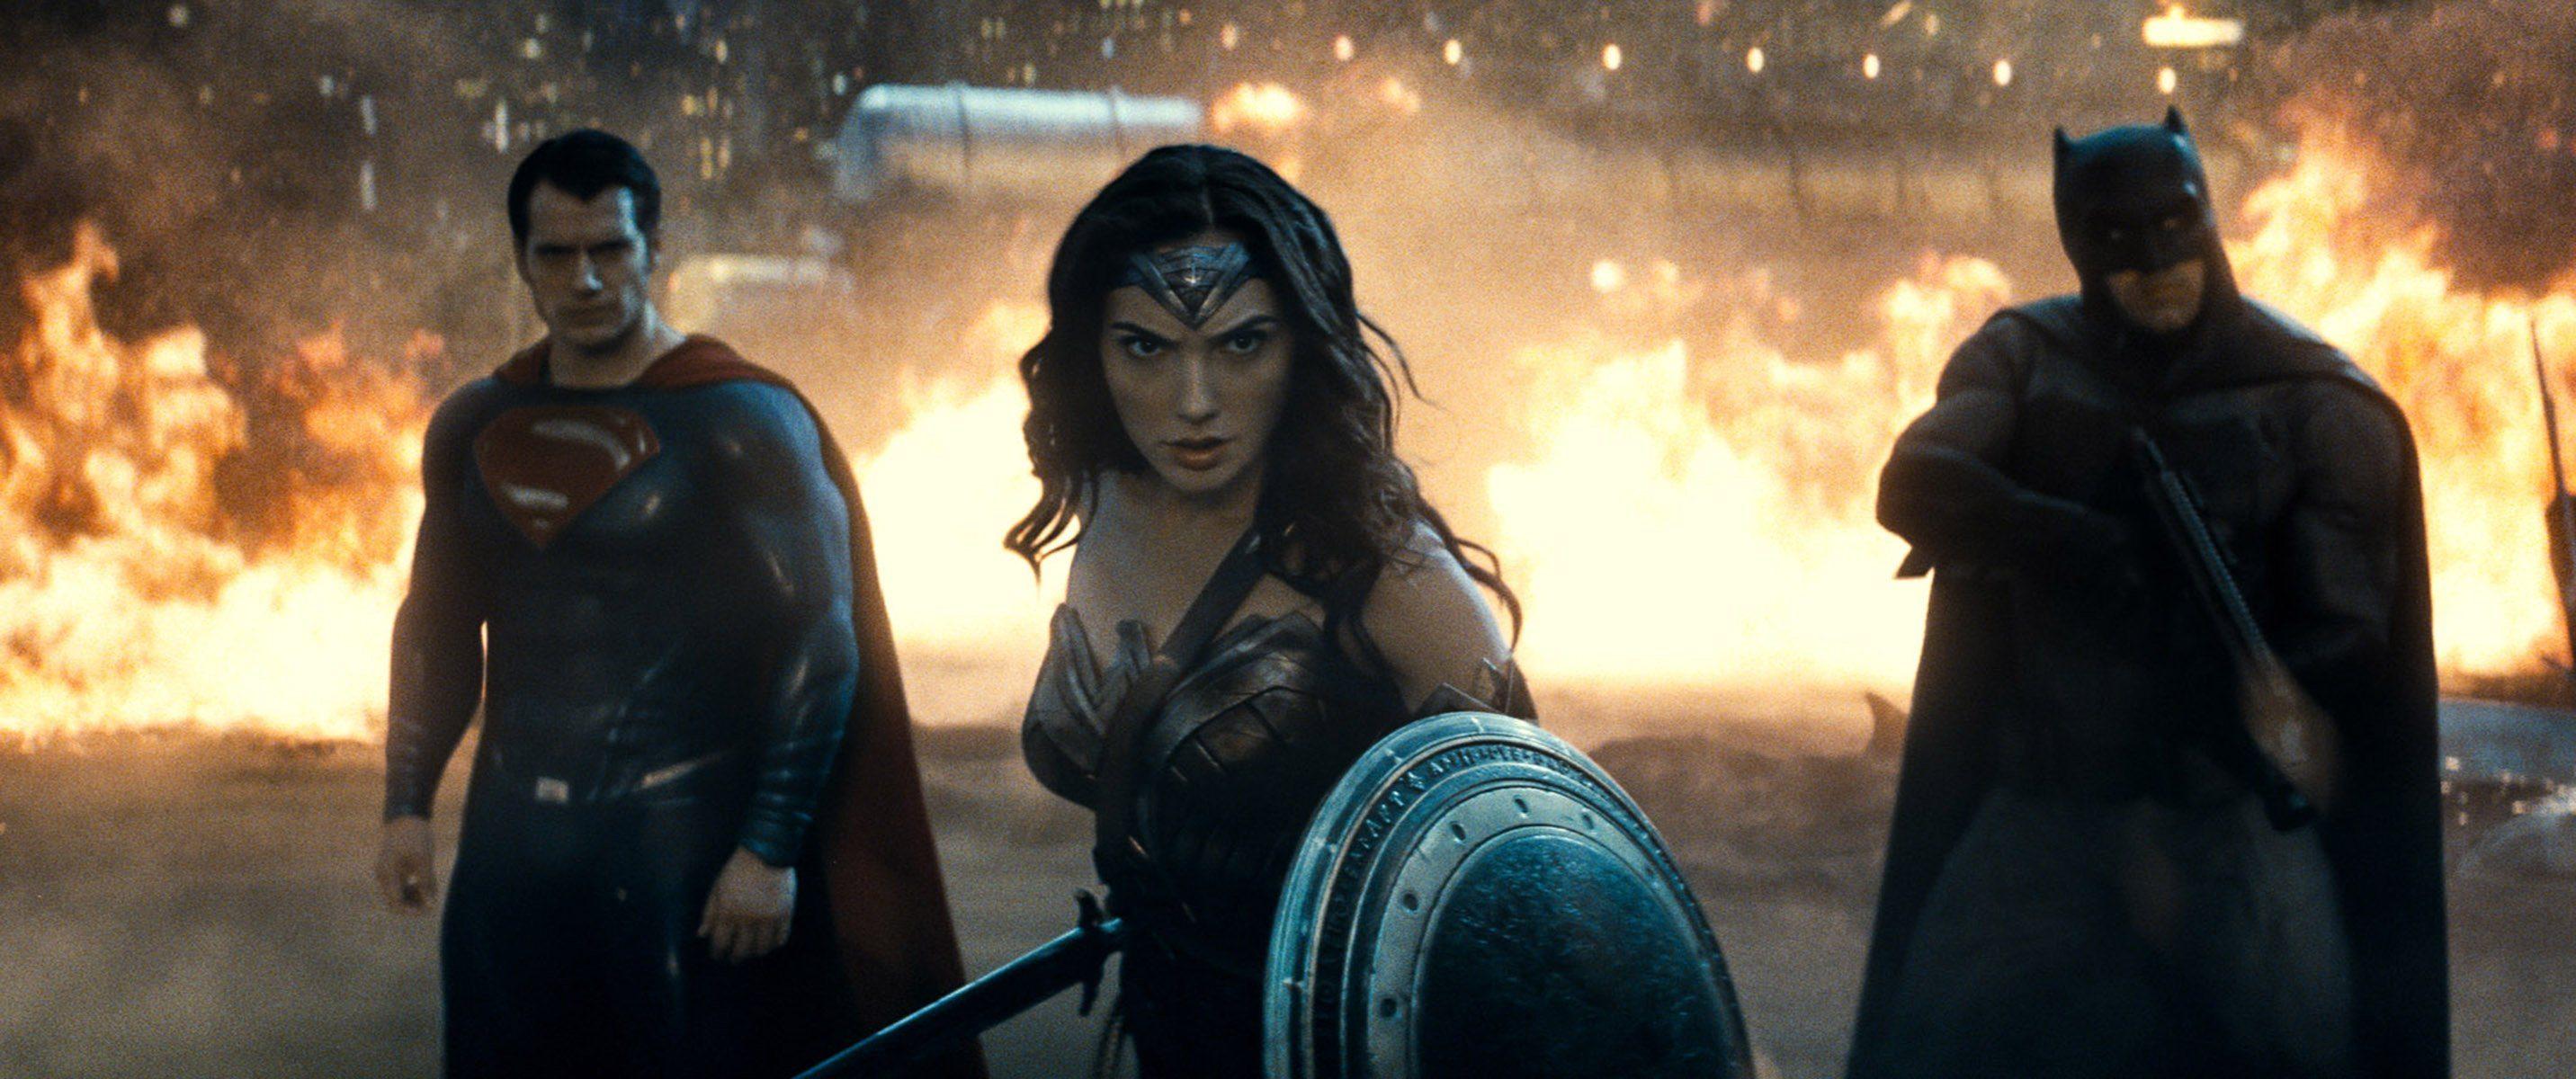 (Batman V Superman: Dawn of Justice, Warner Bros Pictures)